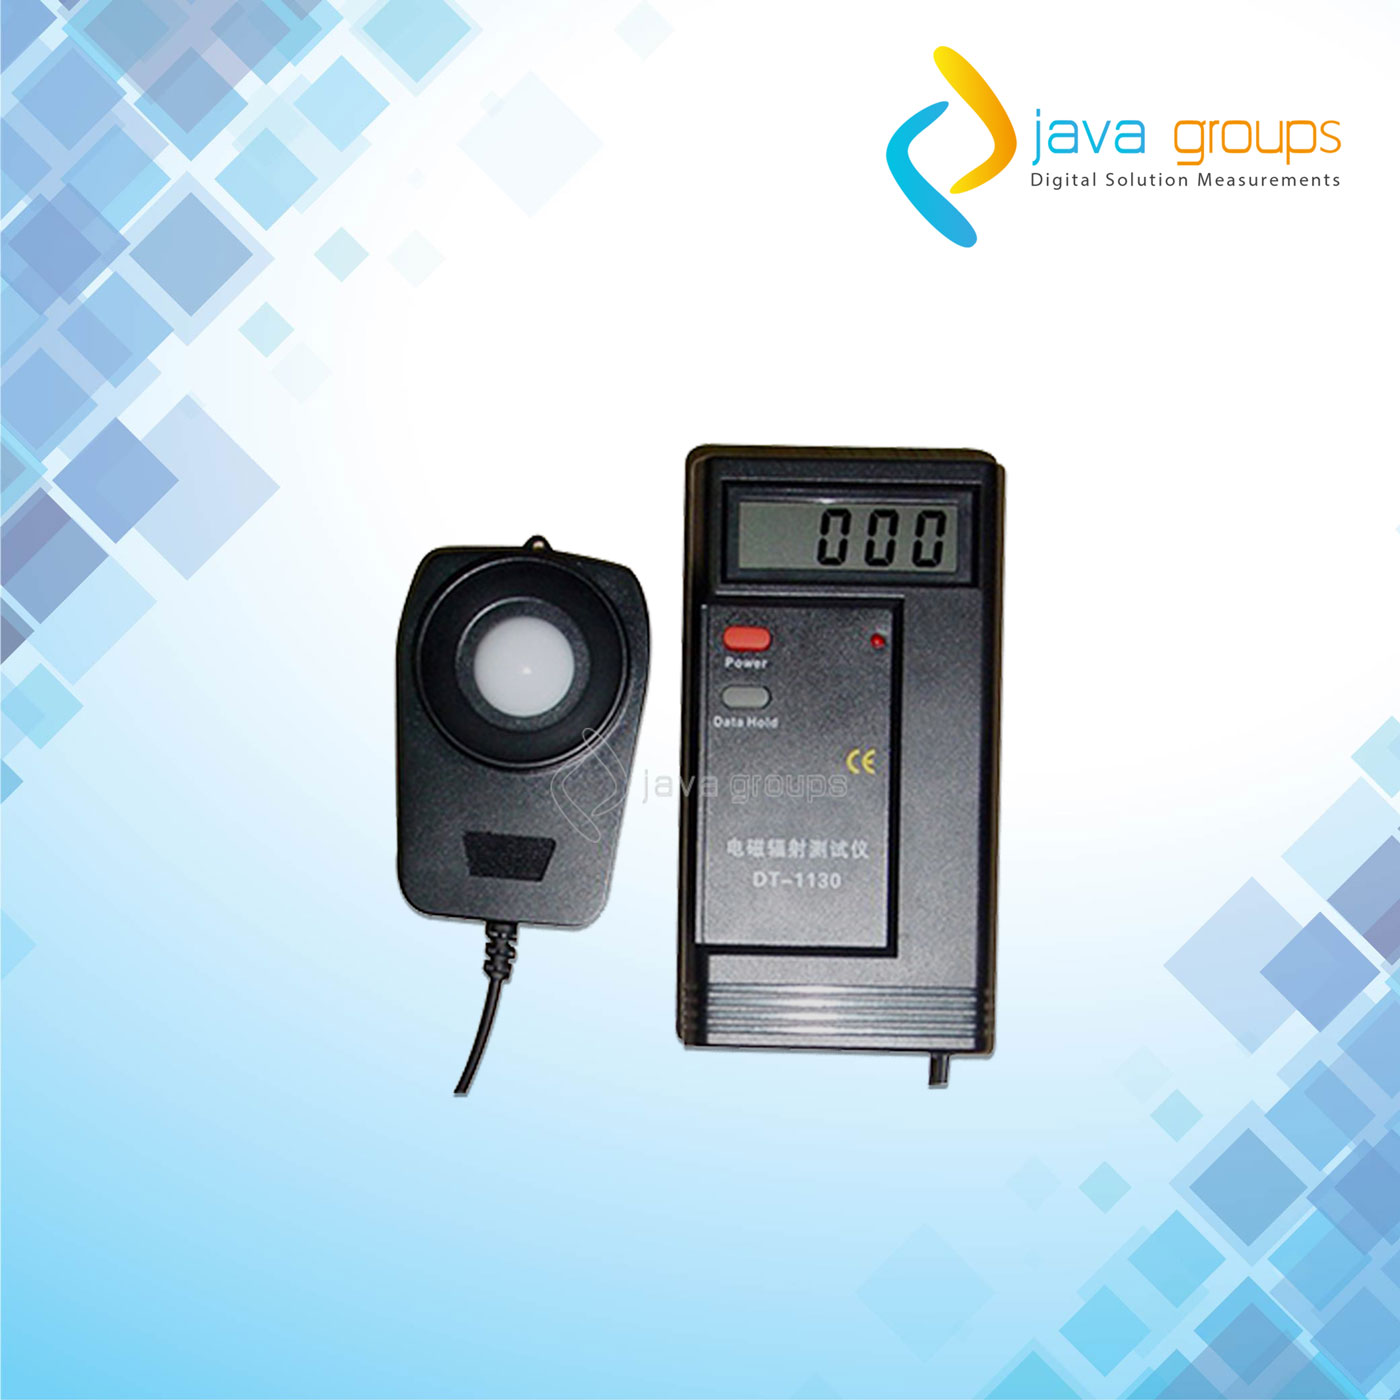 Alat Pengukur Tingkat Radiasi Elektromagnetik Seri DT-1130